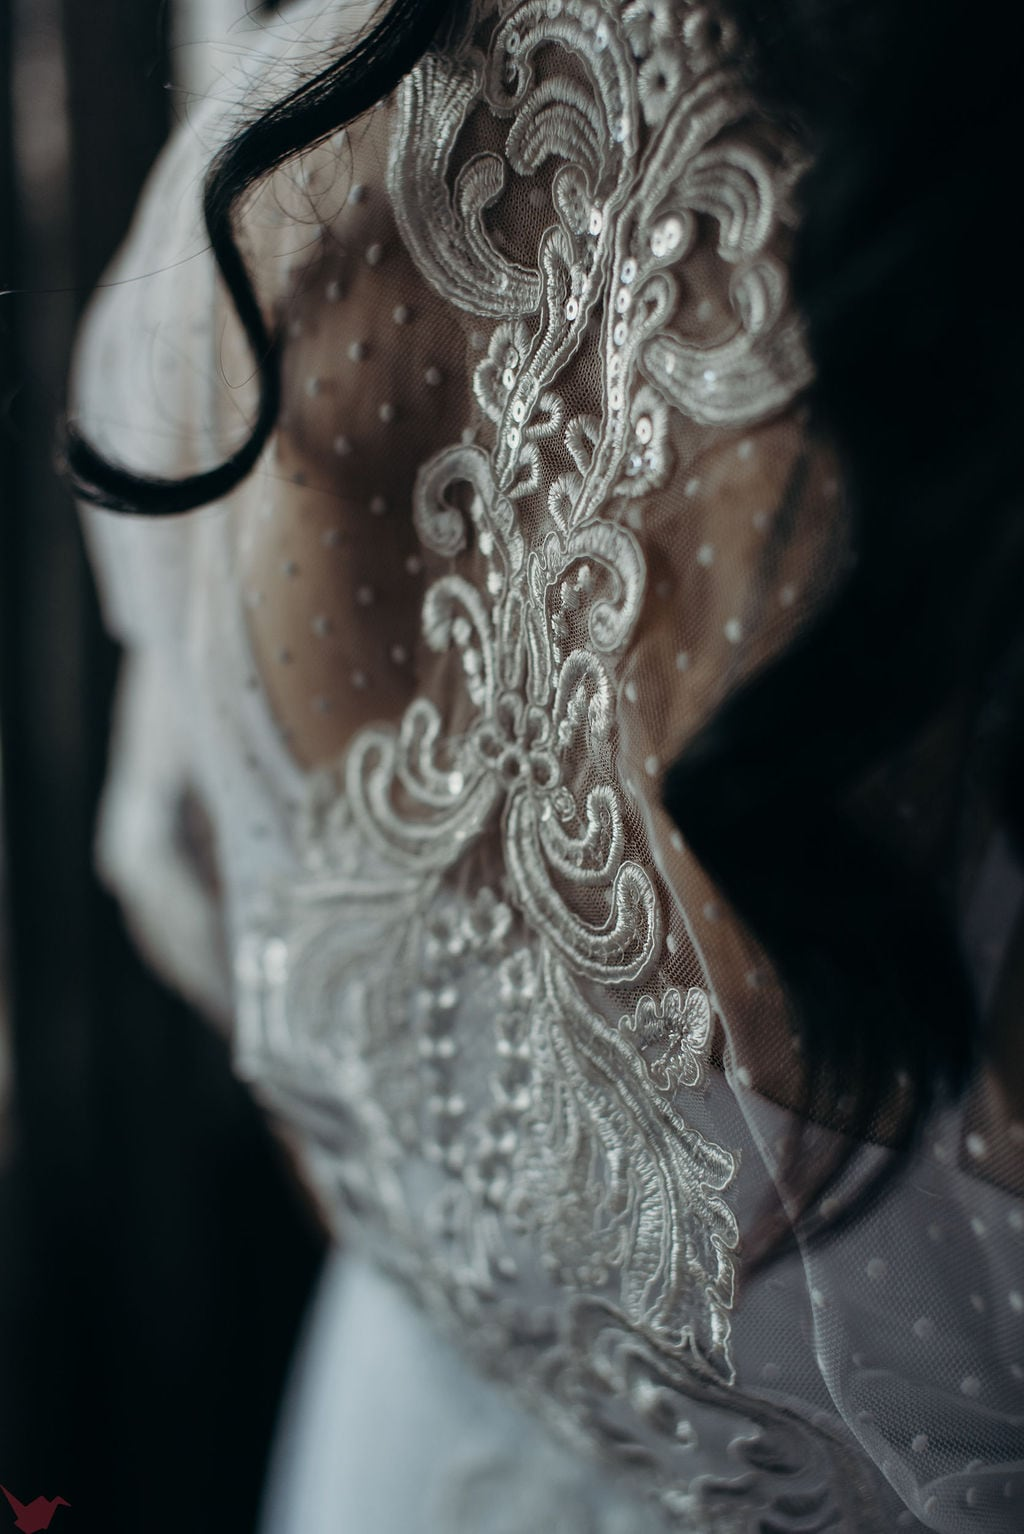 james-felicia-papercrane-wedding-photography-8.jpg